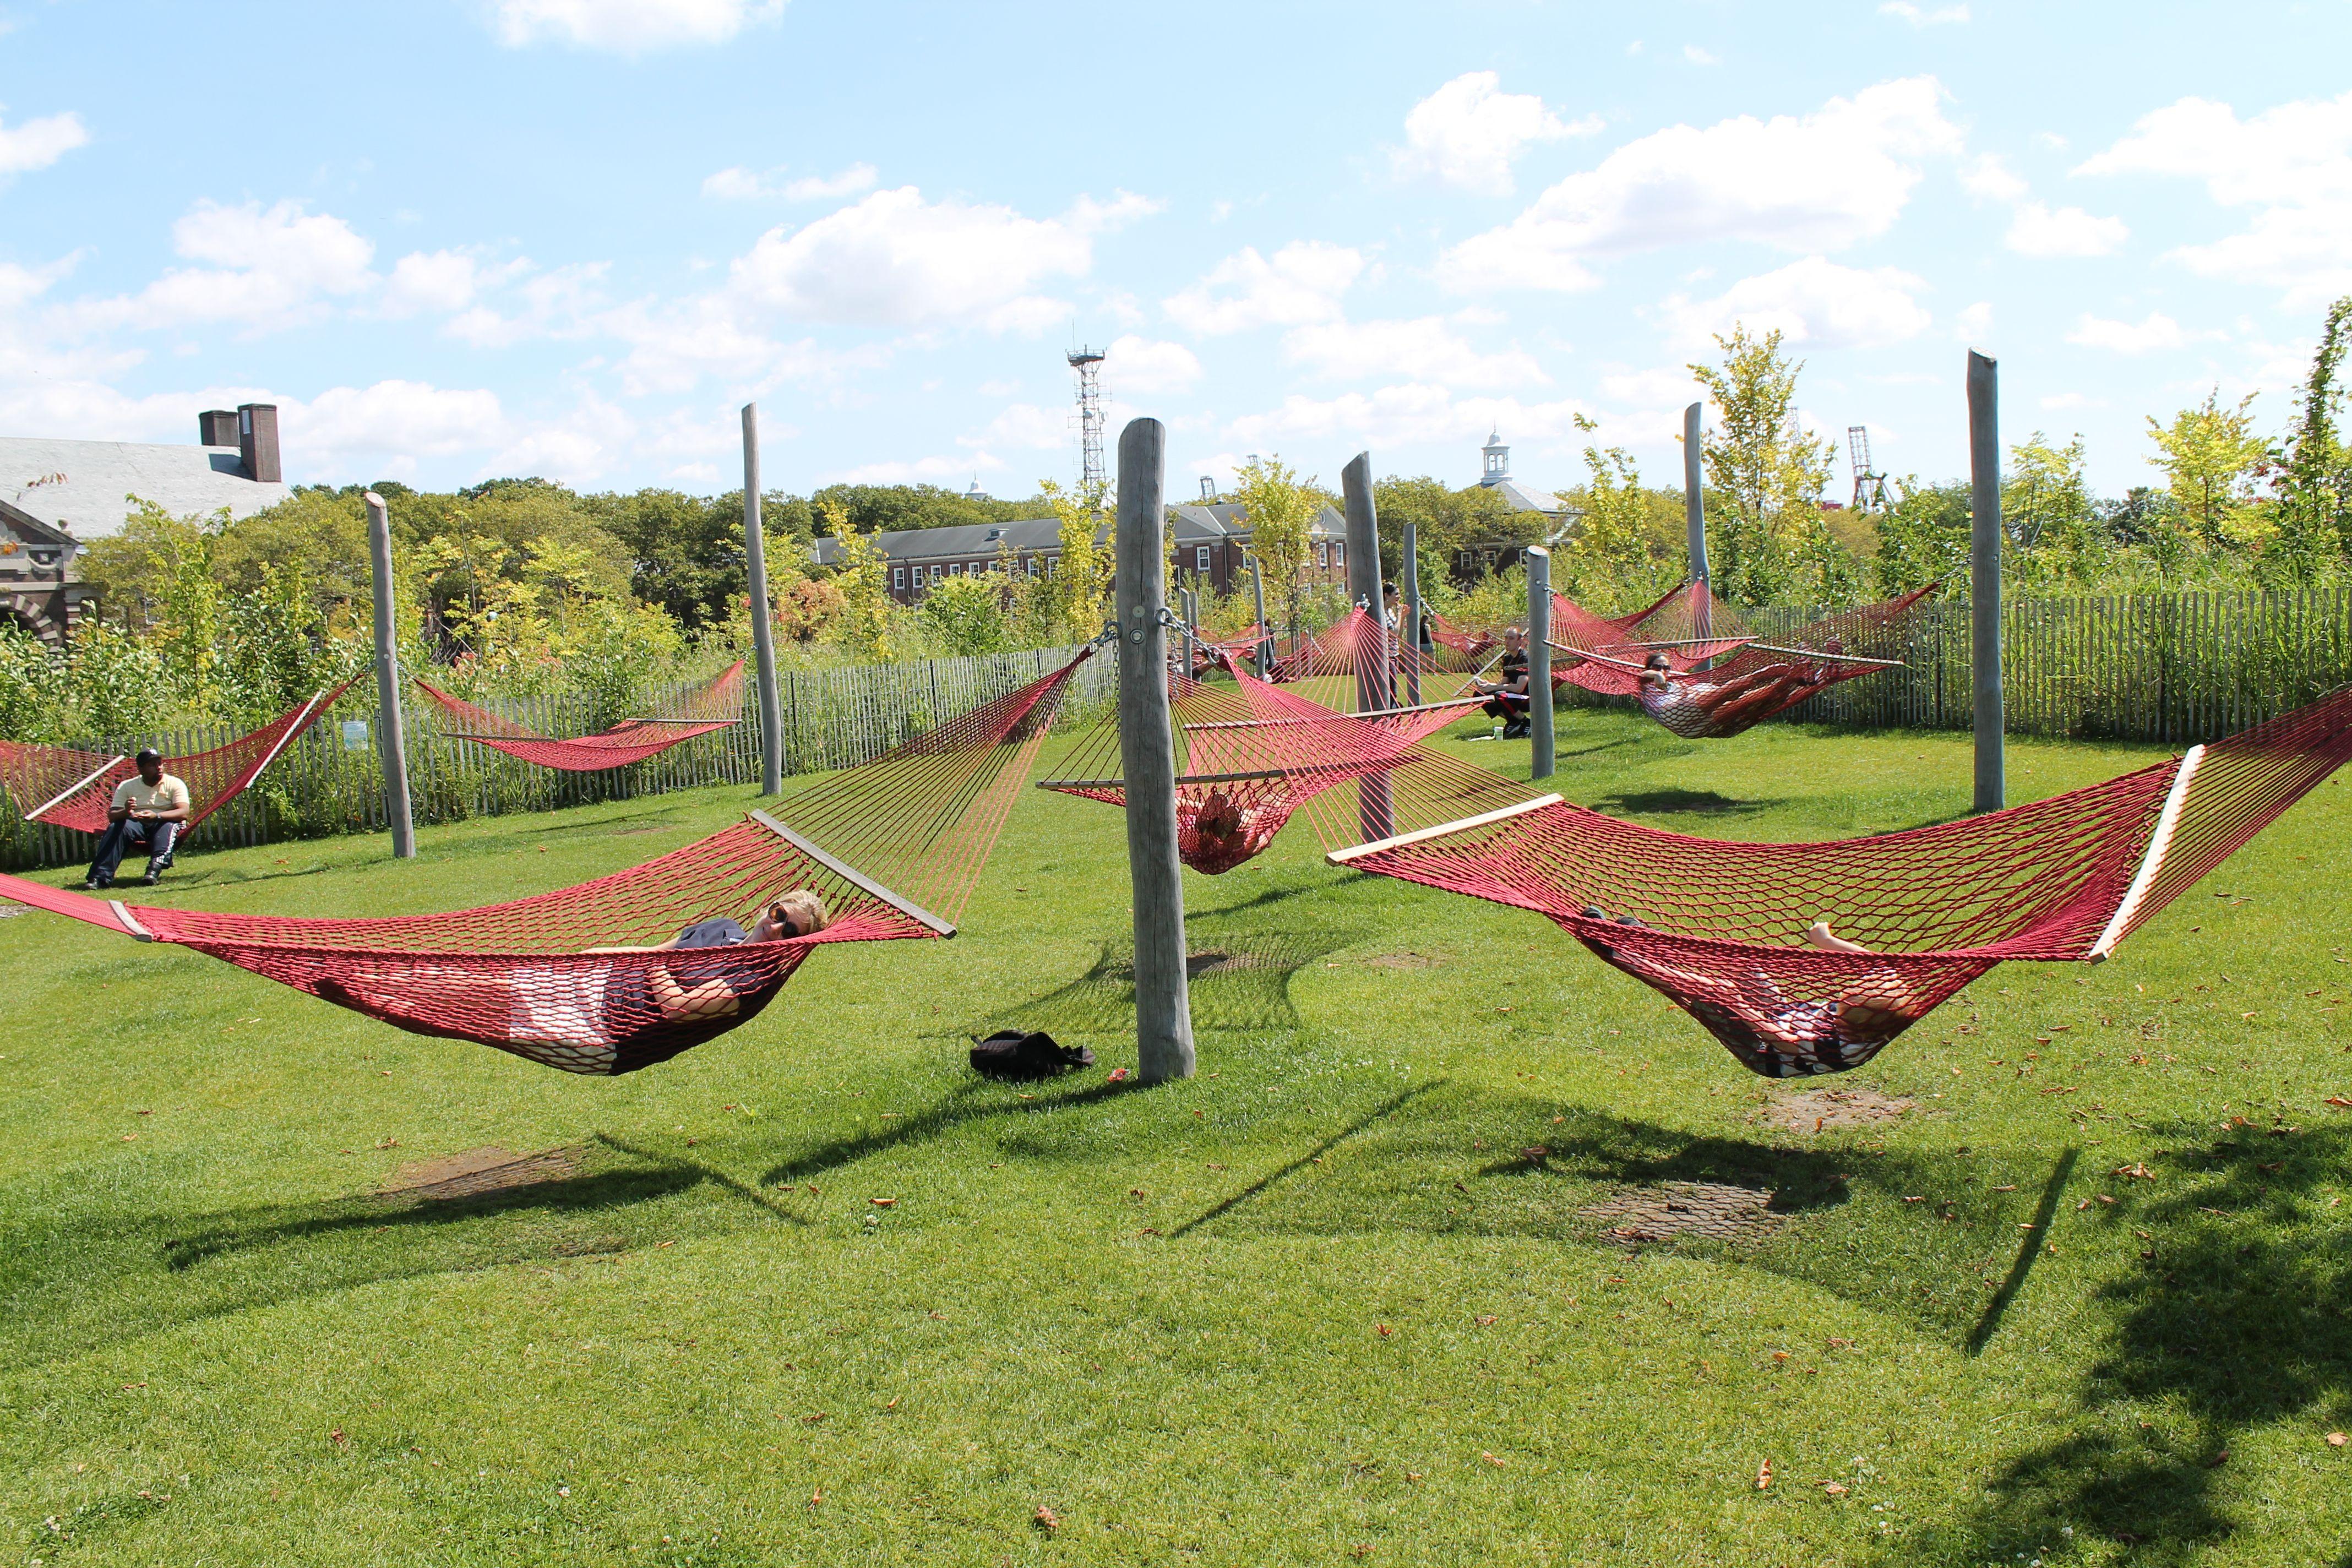 Hammock Grove/Governors Island Urban park, Outdoor